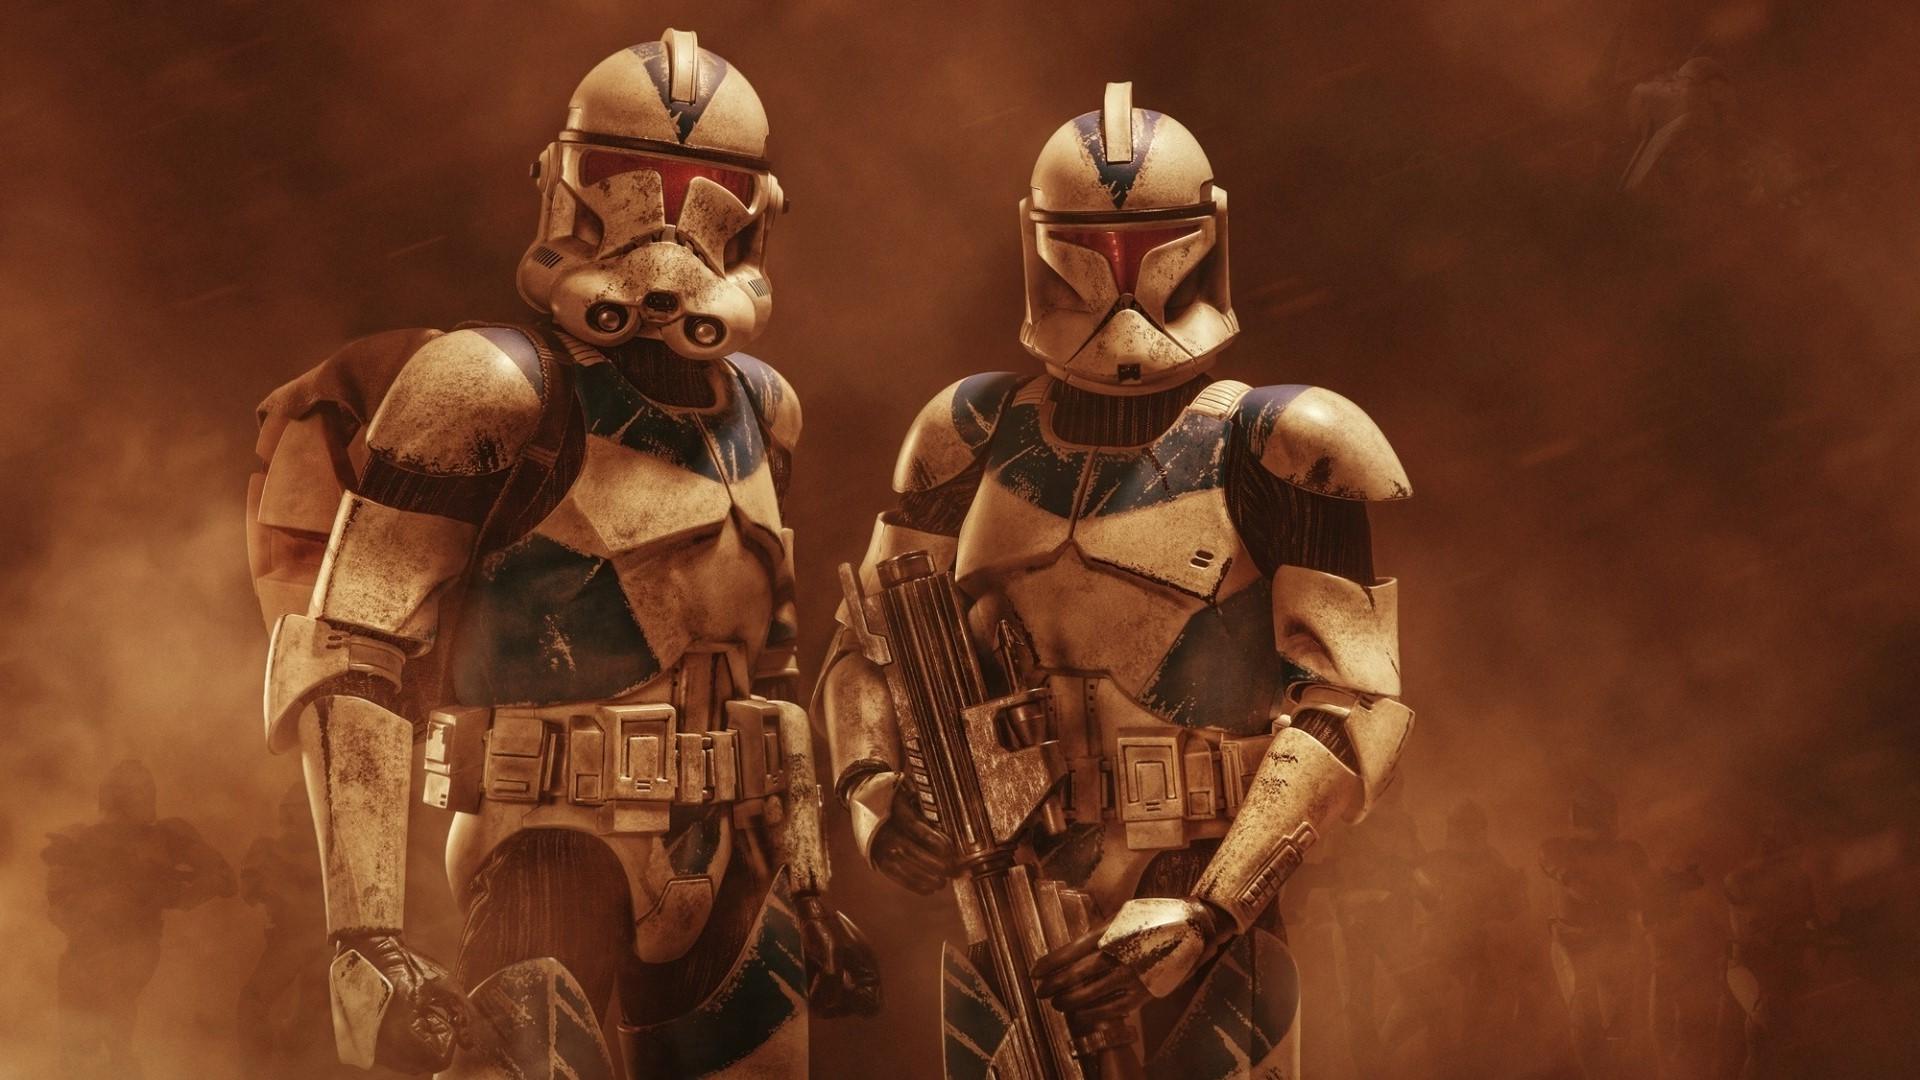 Star Wars Clone Trooper Wallpaper 61 Pictures